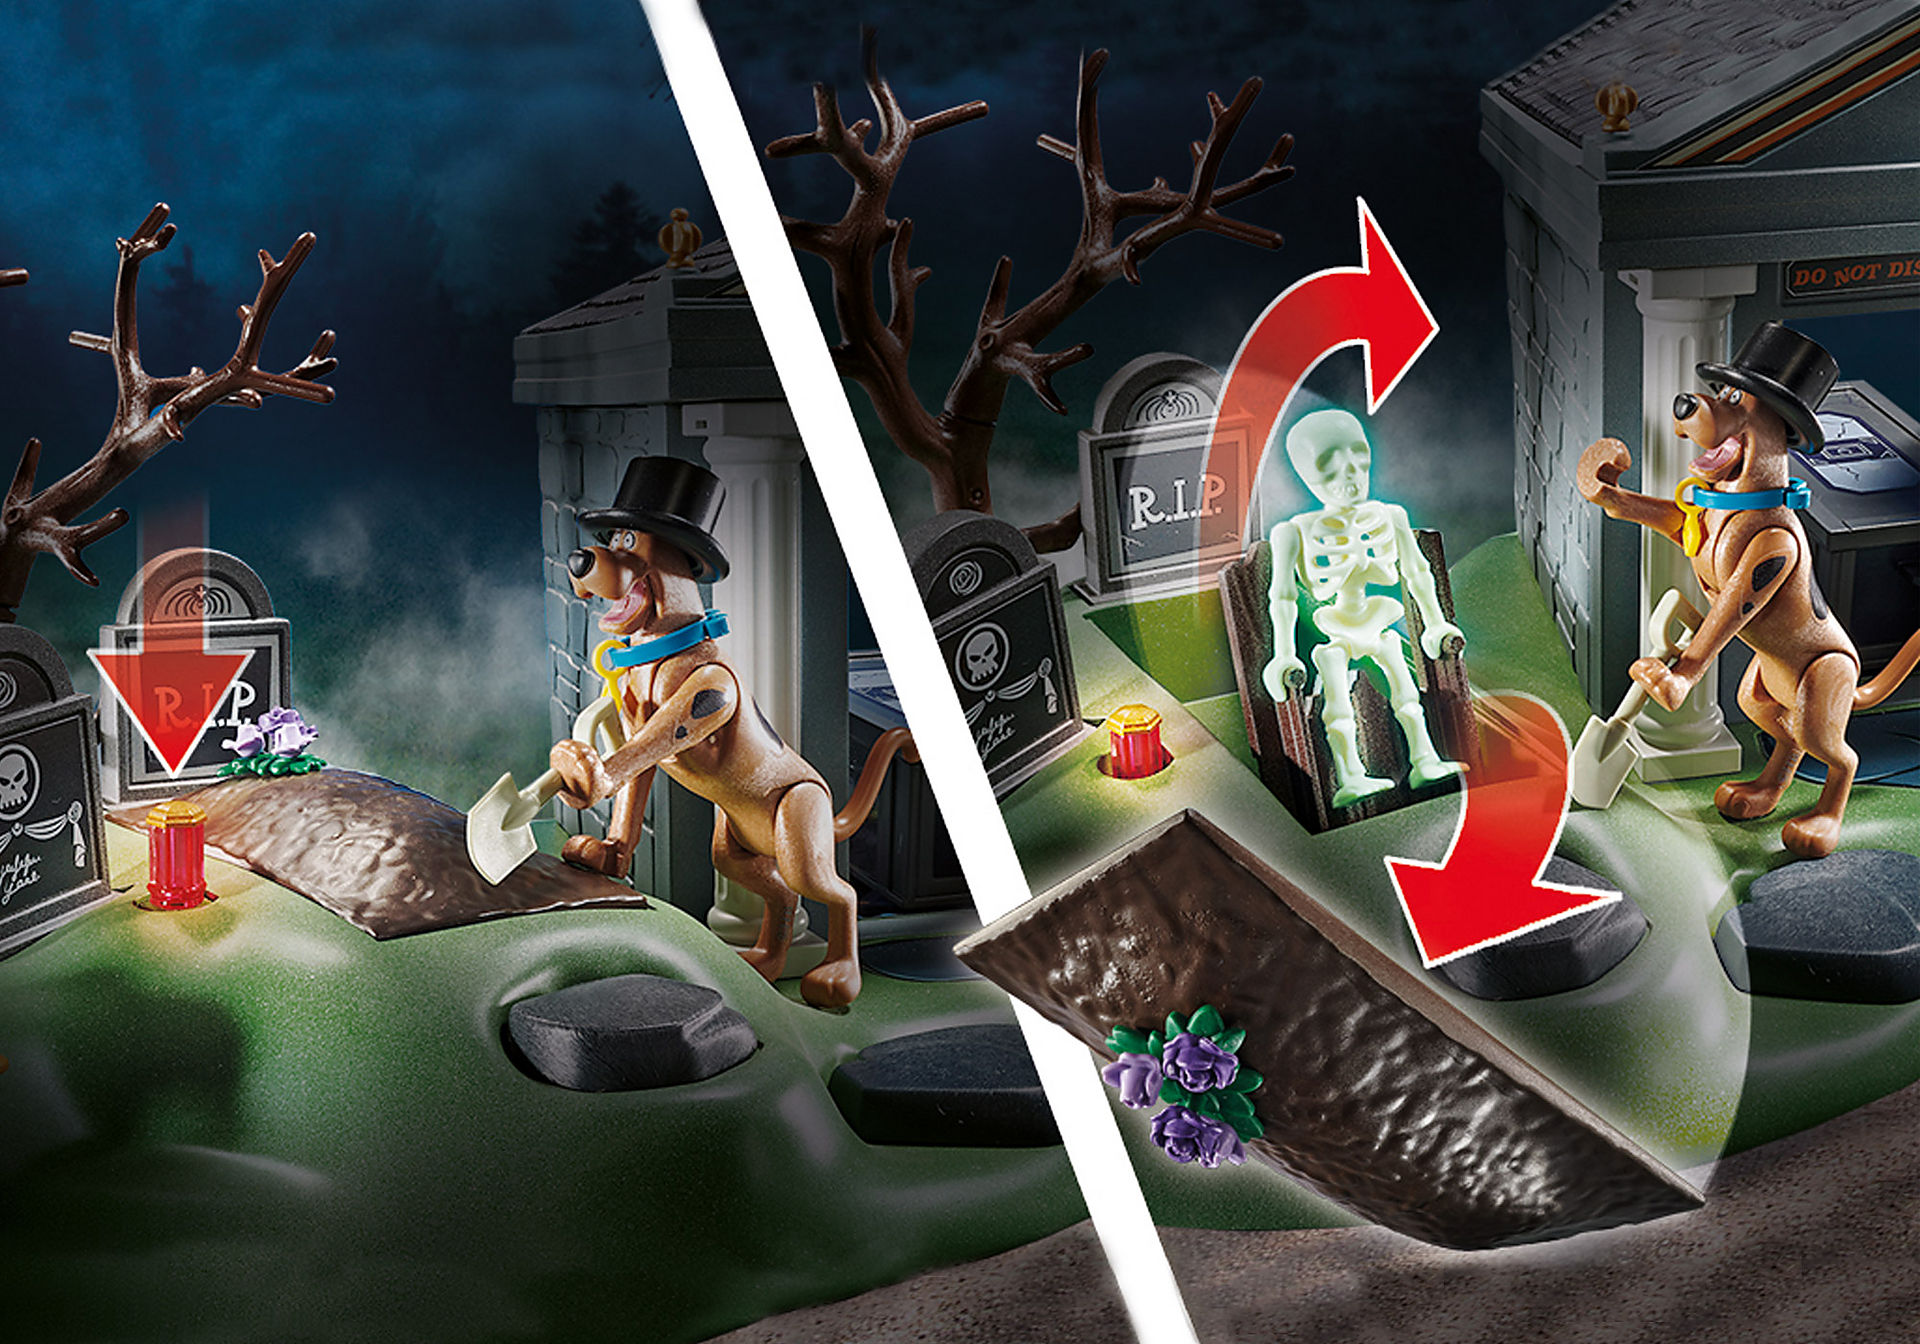 70362 SCOOBY-DOO! Adventure in the Cemetery zoom image6